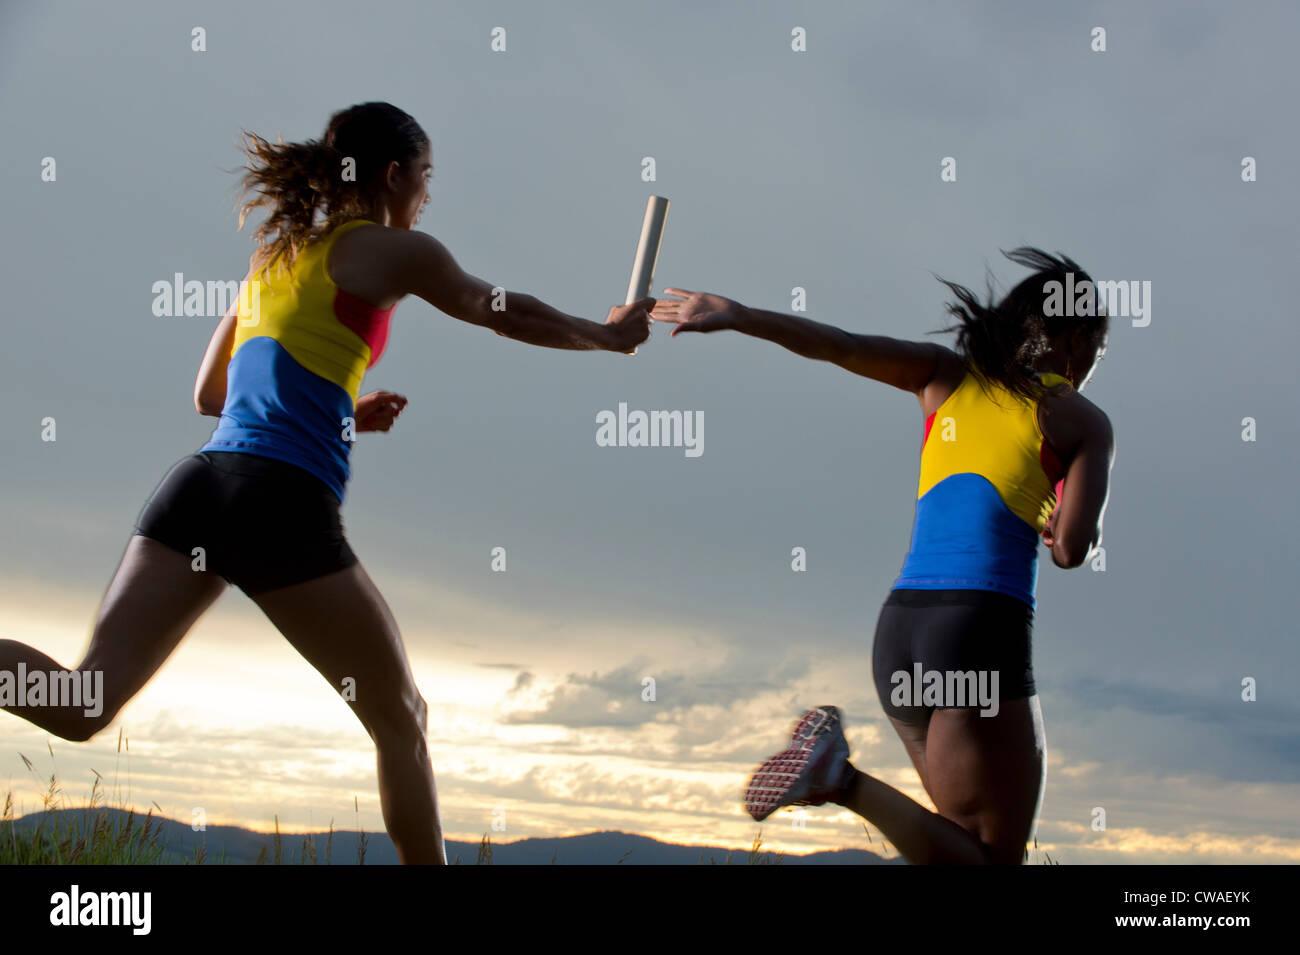 Female relay racers passing baton - Stock Image